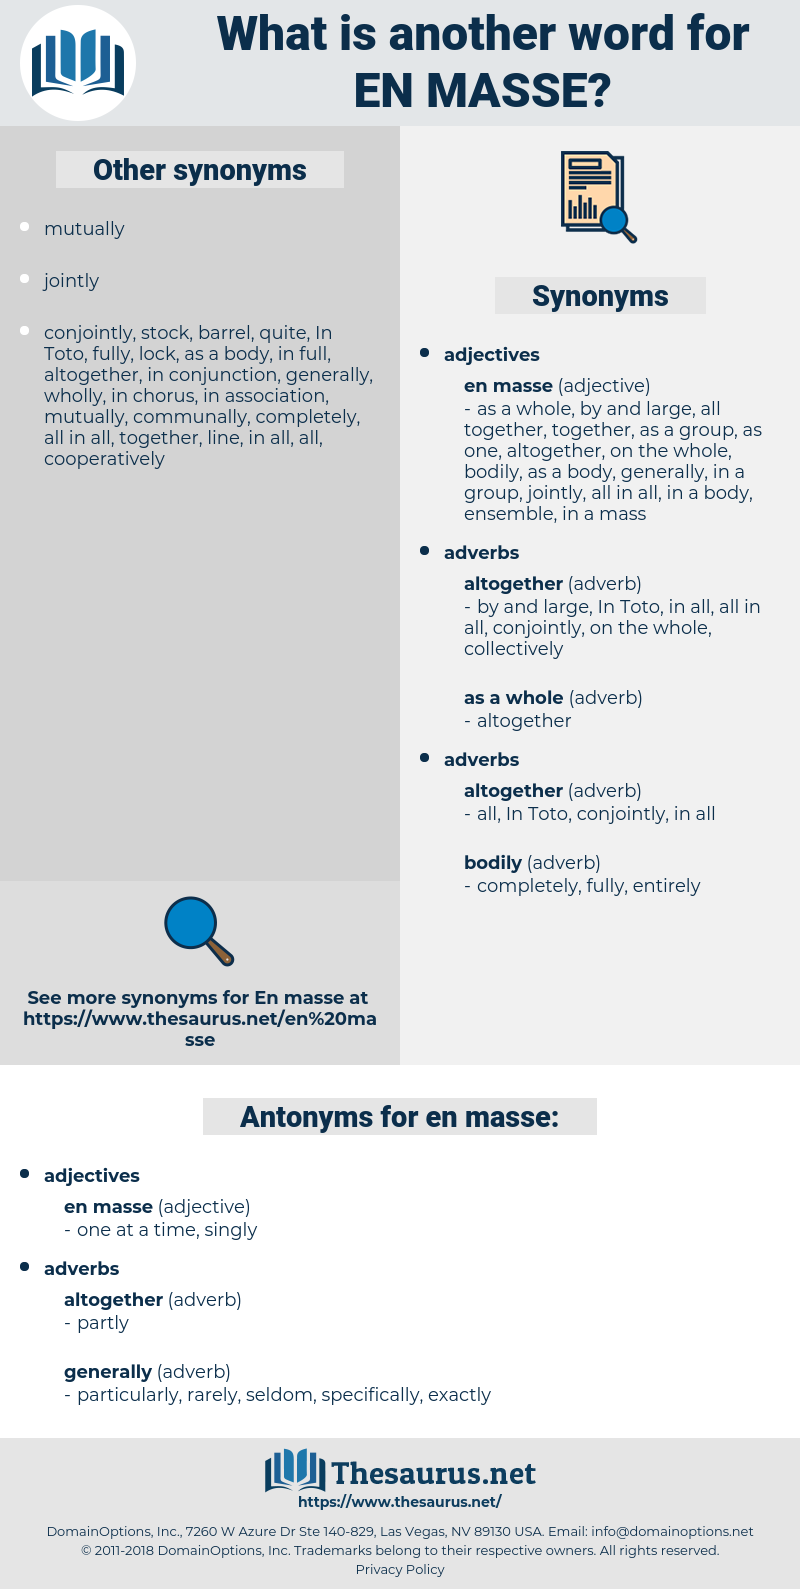 en masse, synonym en masse, another word for en masse, words like en masse, thesaurus en masse